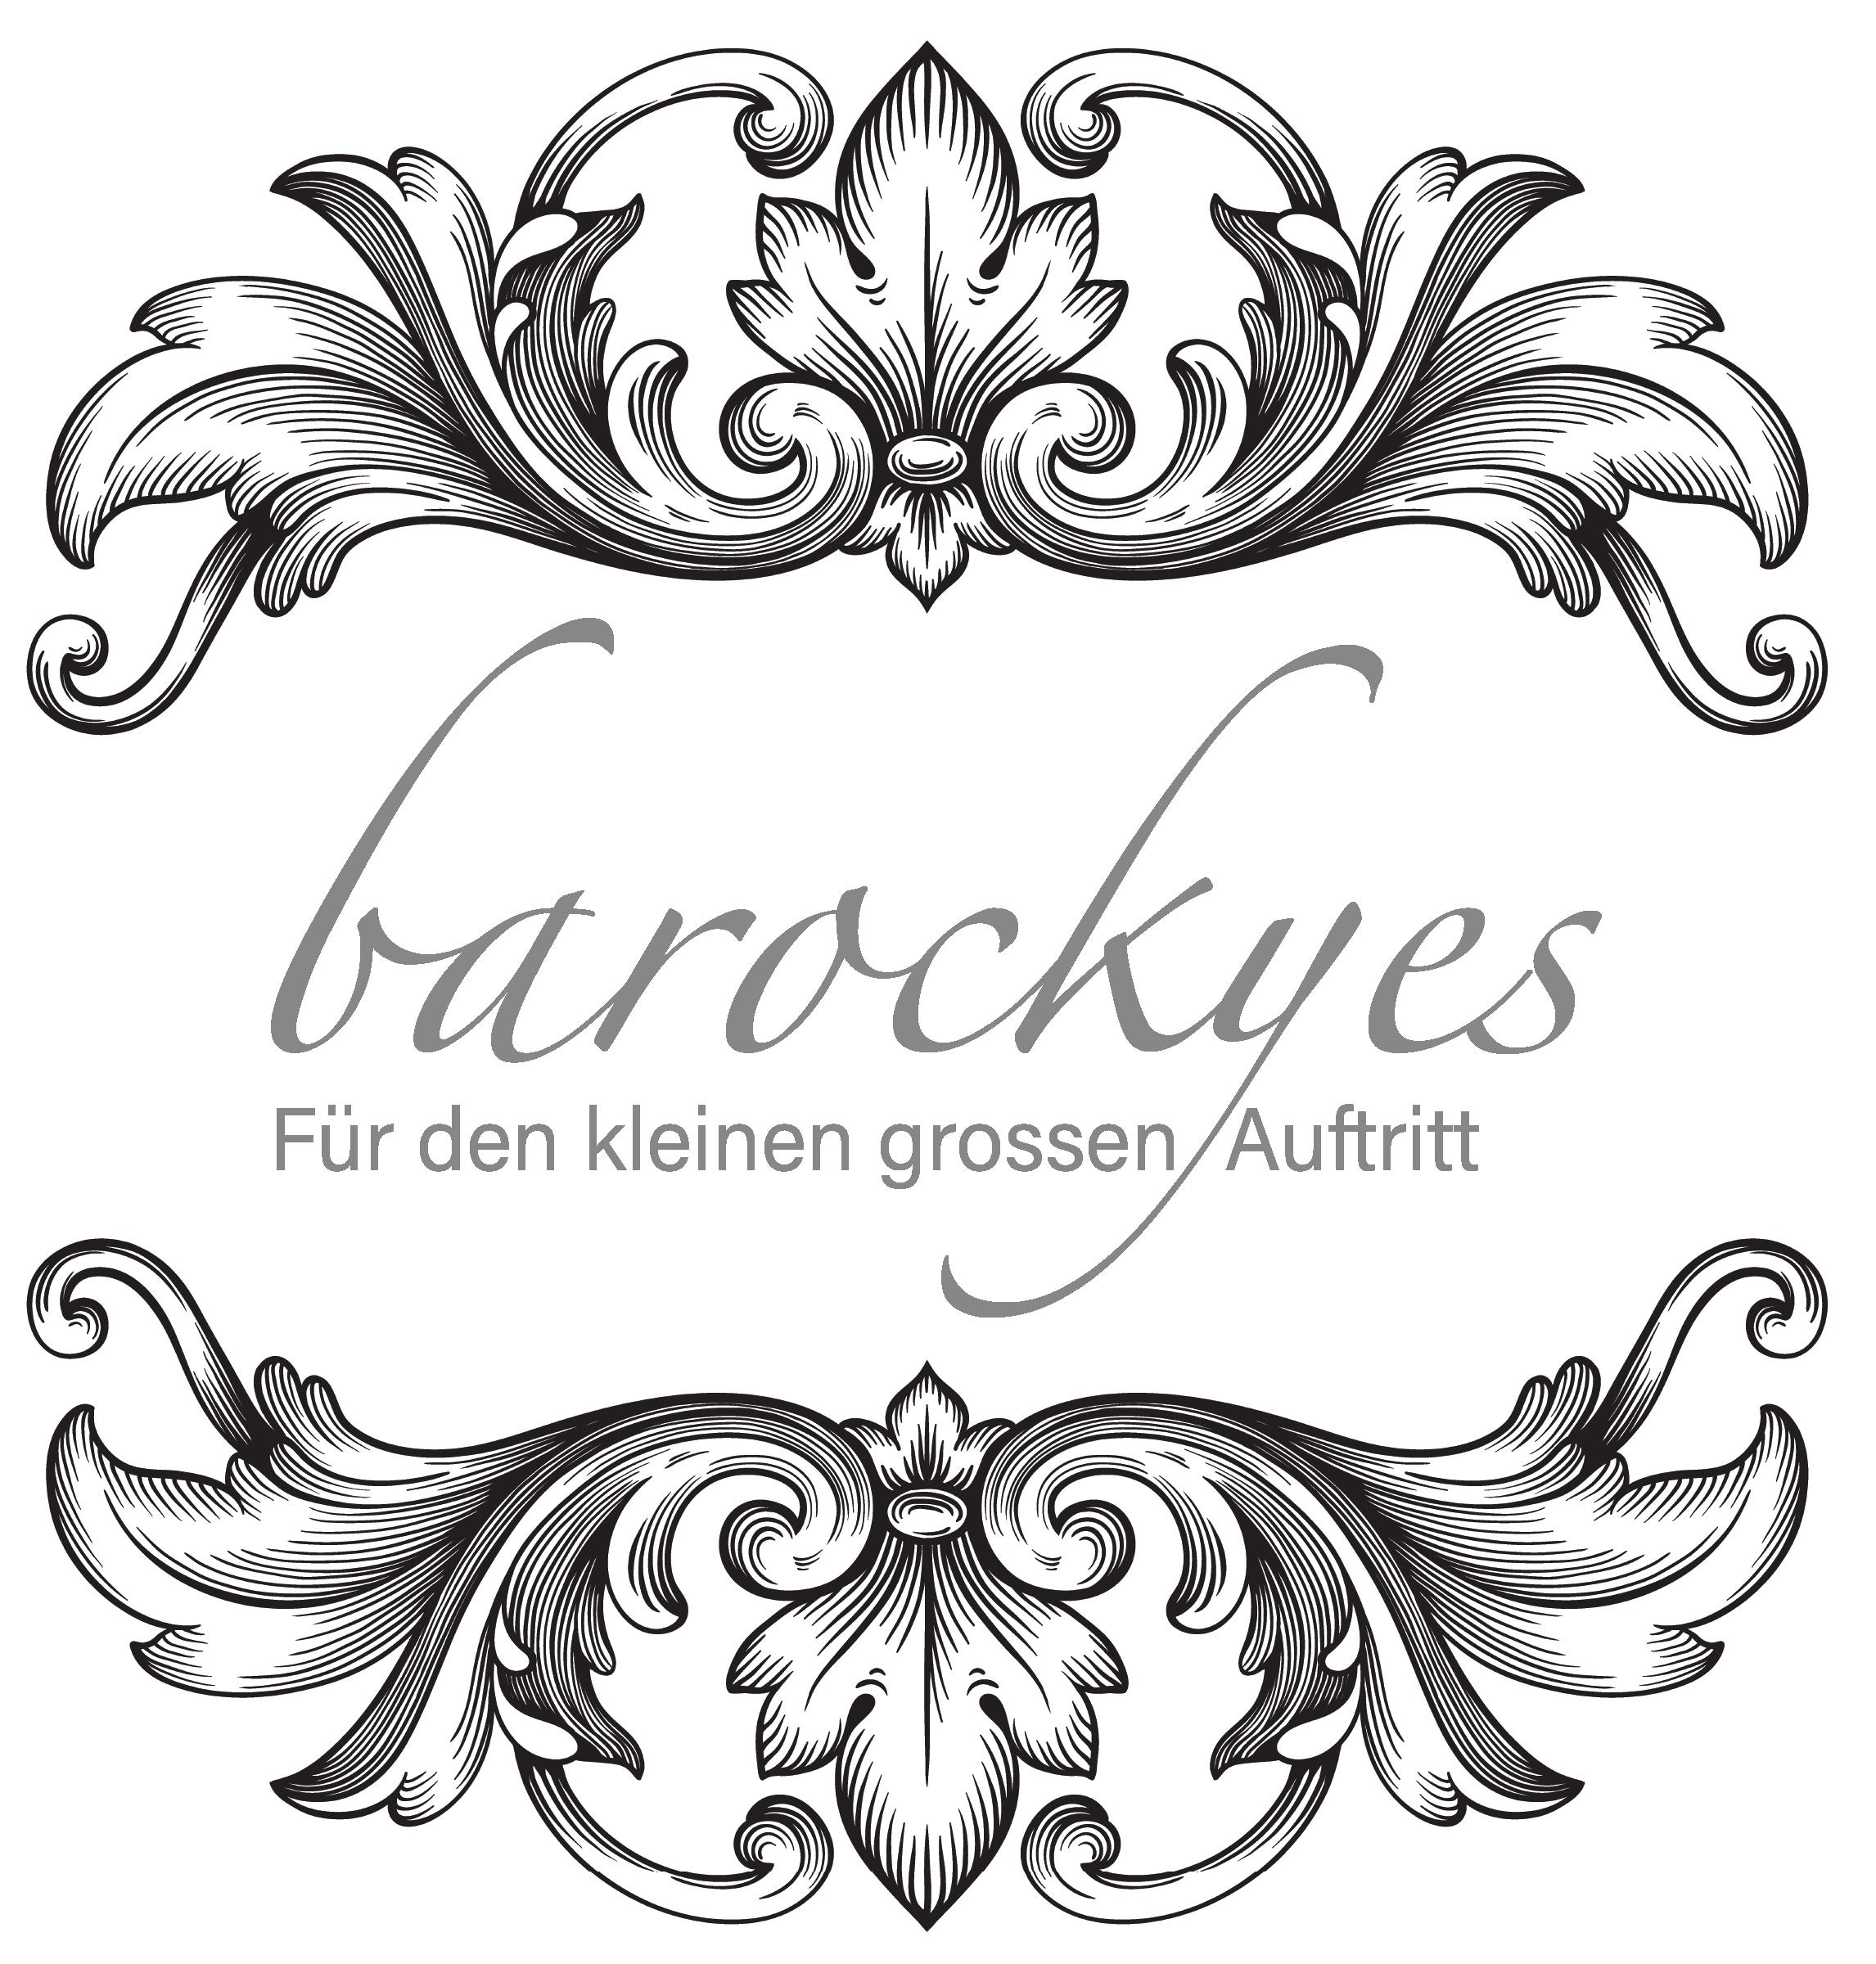 barockyes